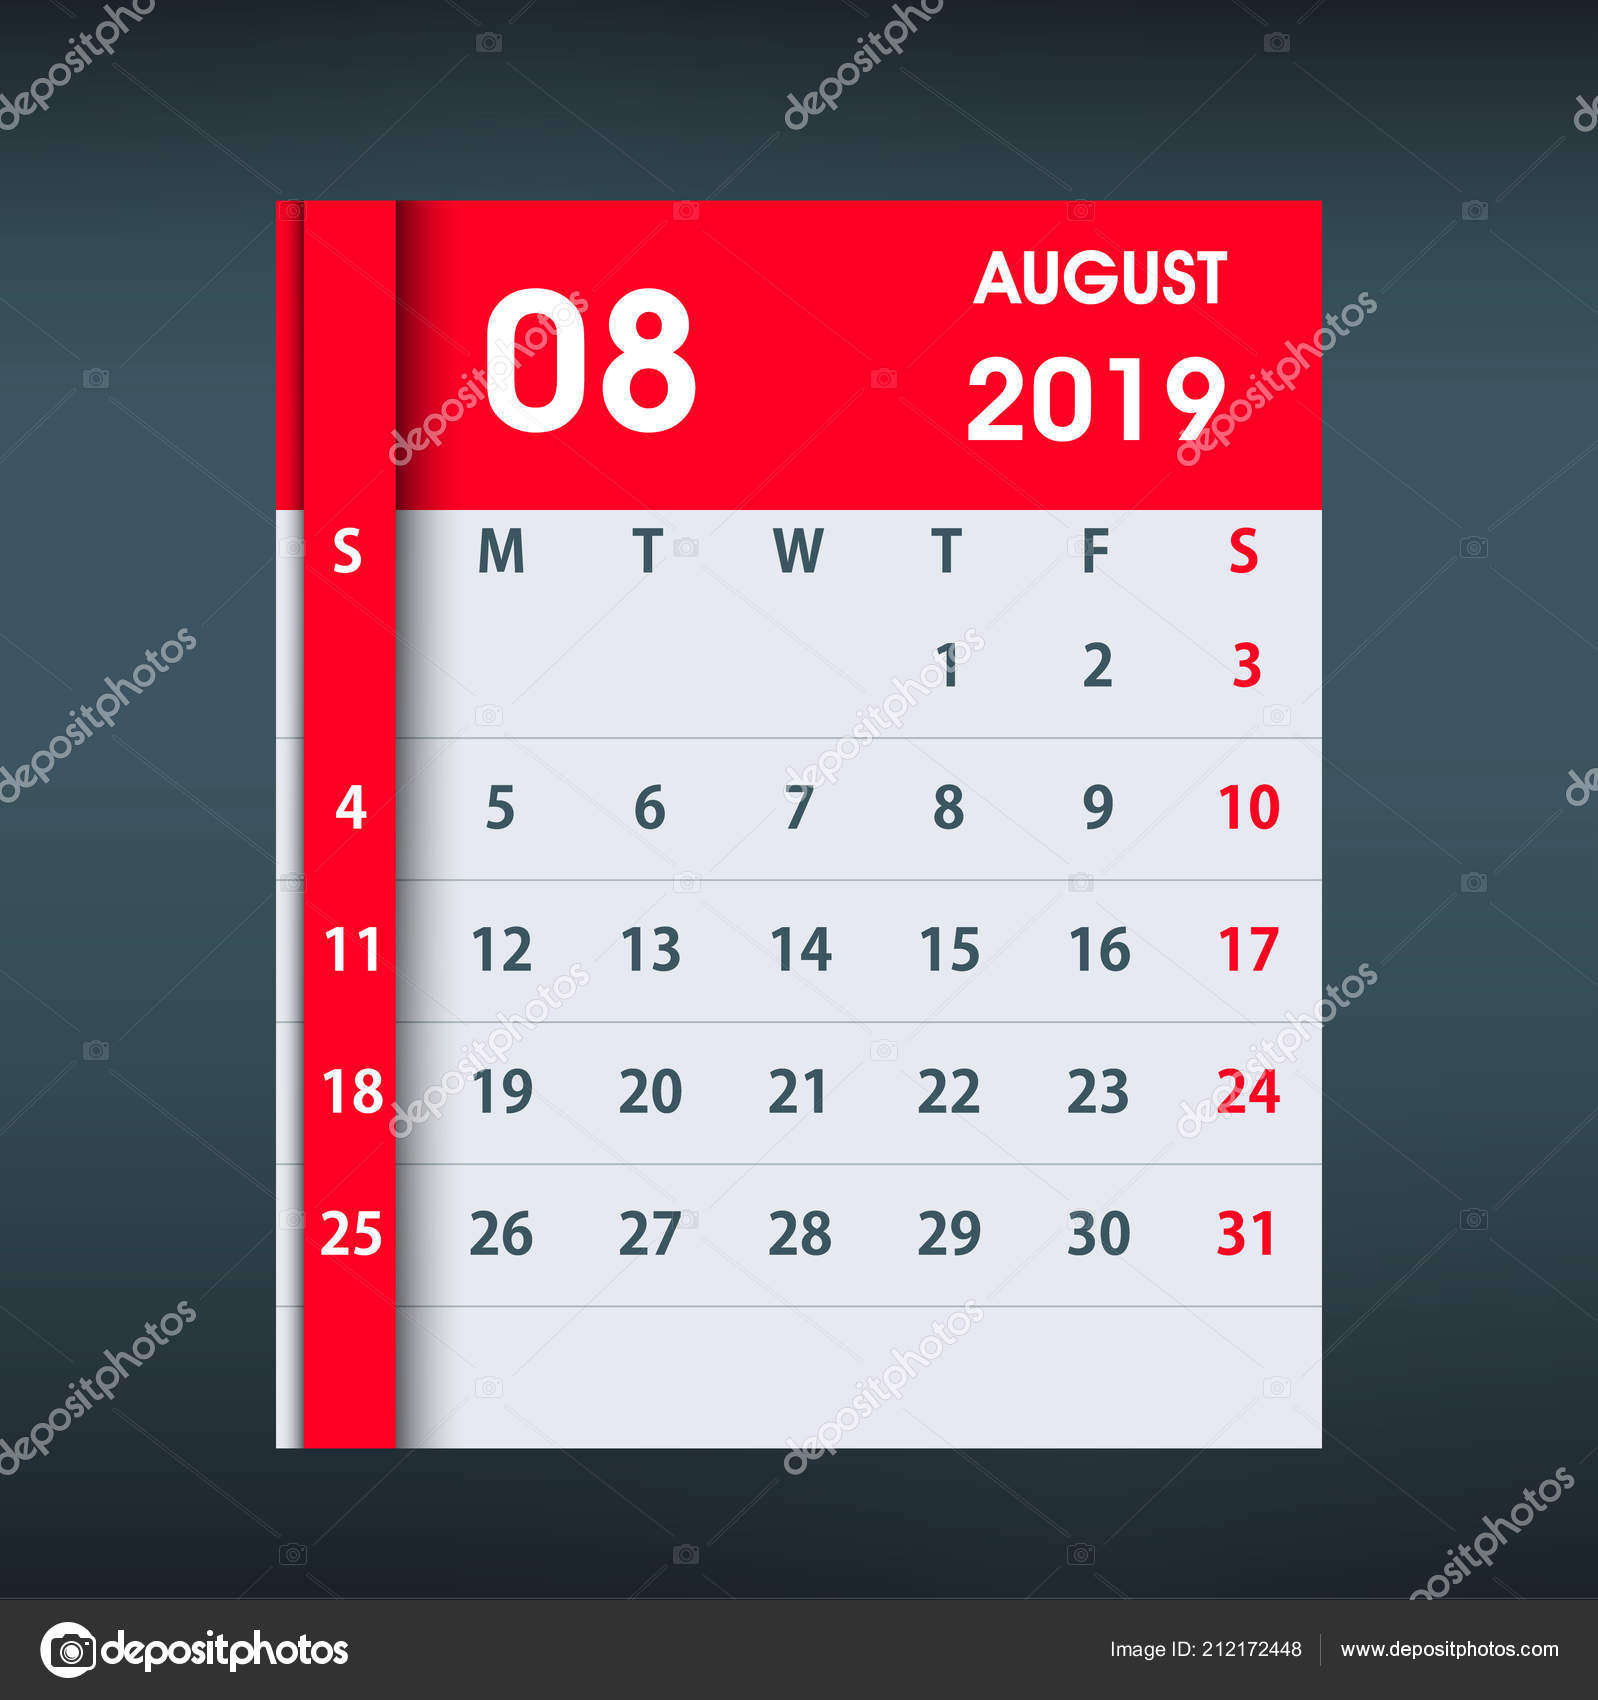 8 Ağustos 2019 Pazar